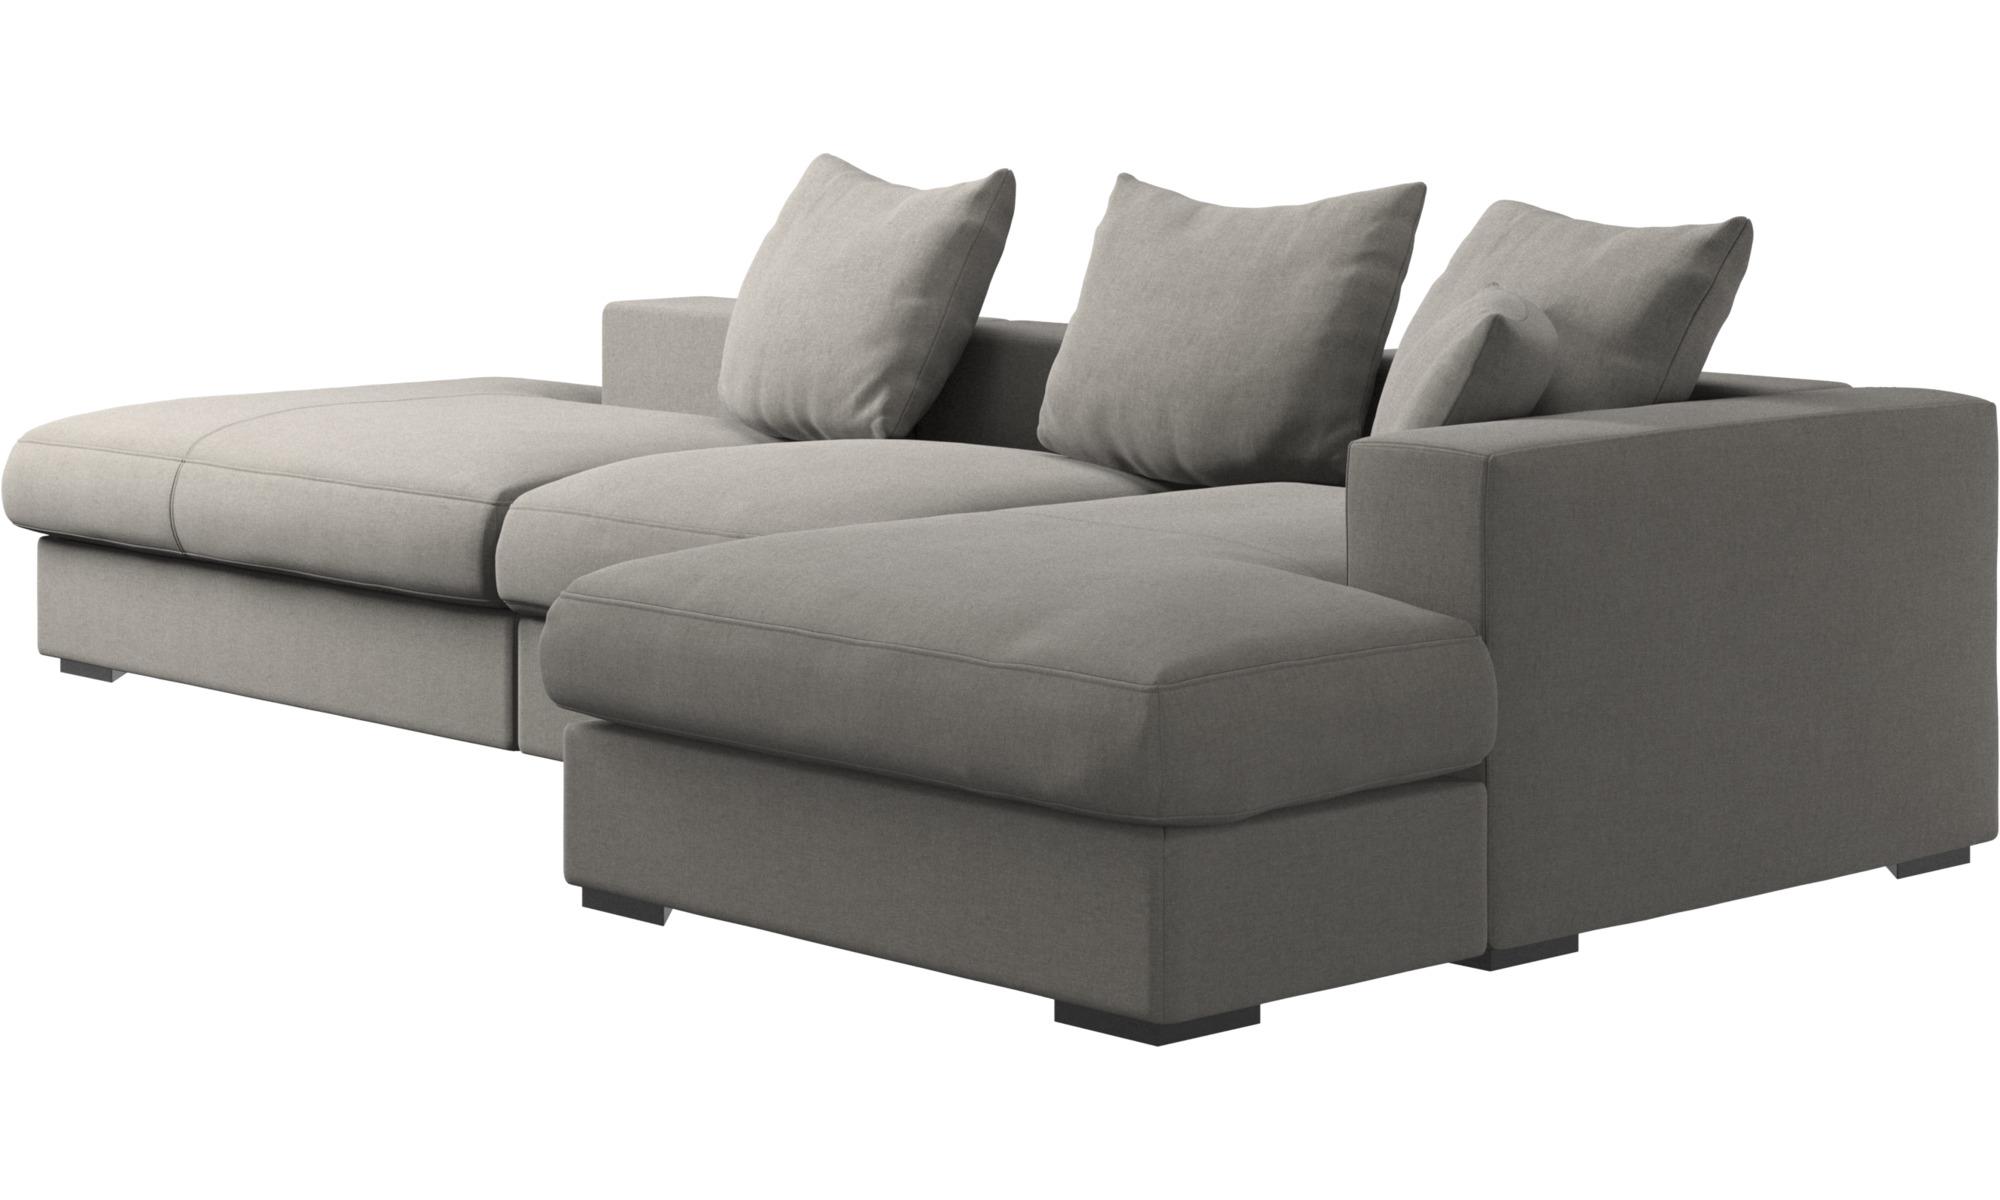 ... 3 Sitzer Sofas   Cenova Sofa Mit Lounge  Und Ruhemodul   Grau   Stoff  ...